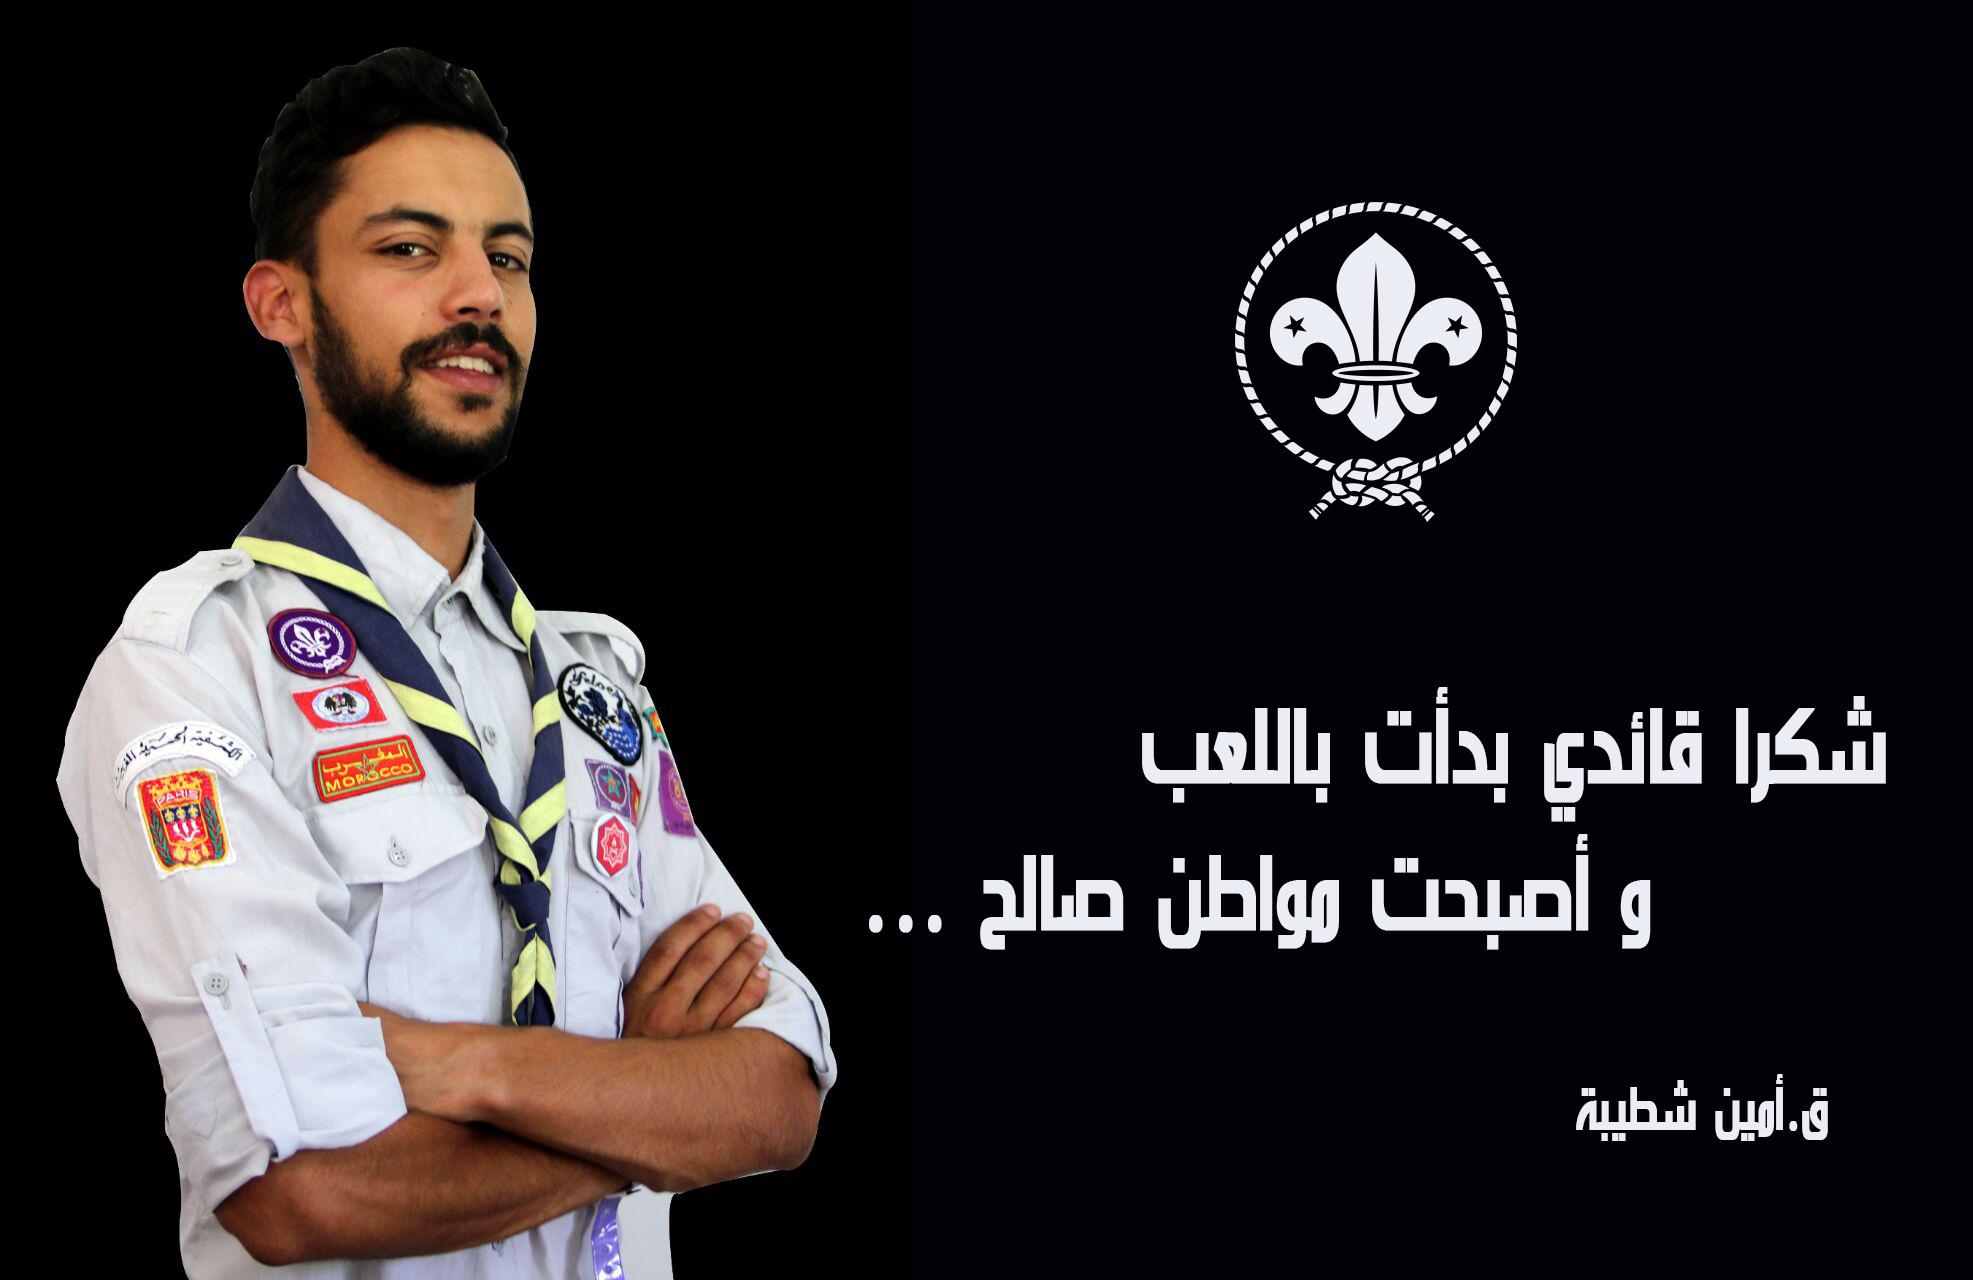 Photo of شكرا قائدي بدأت باللعب و أصبحت مواطن صالح …